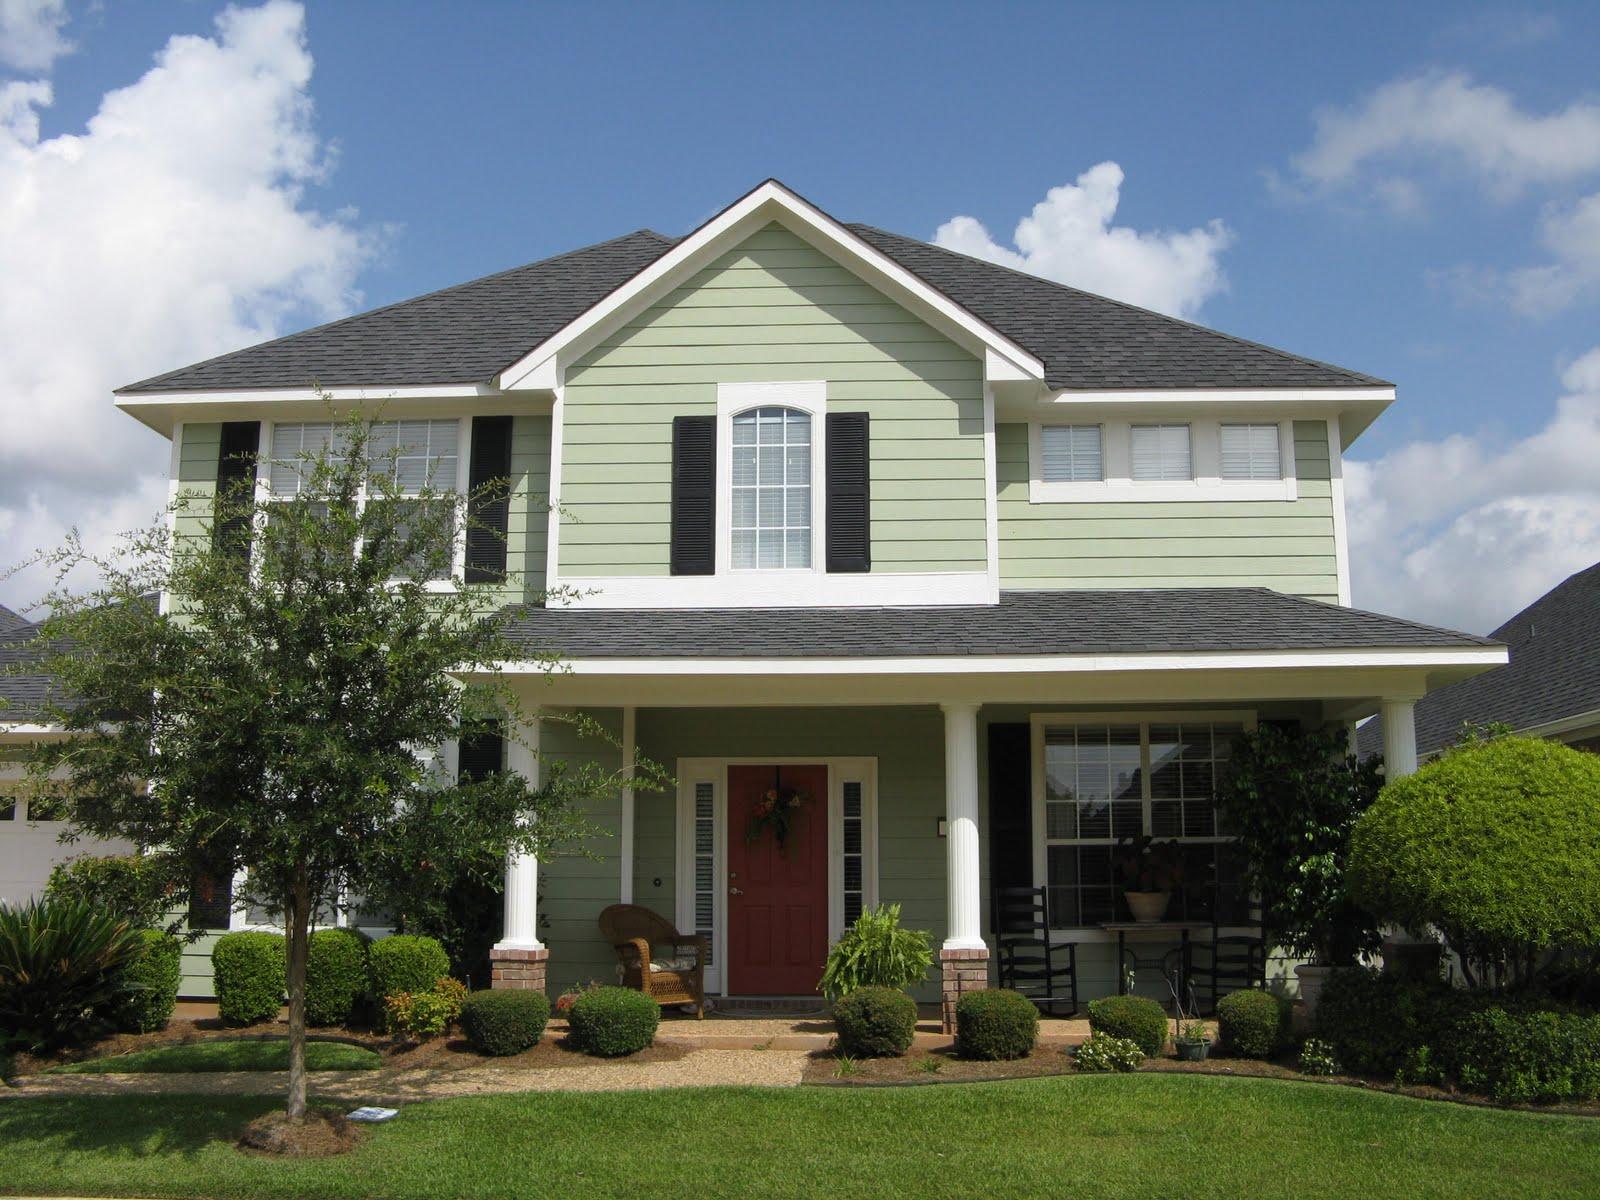 Phenomenal 17 Best Images About Exterior Paint Colors On Pinterest Largest Home Design Picture Inspirations Pitcheantrous